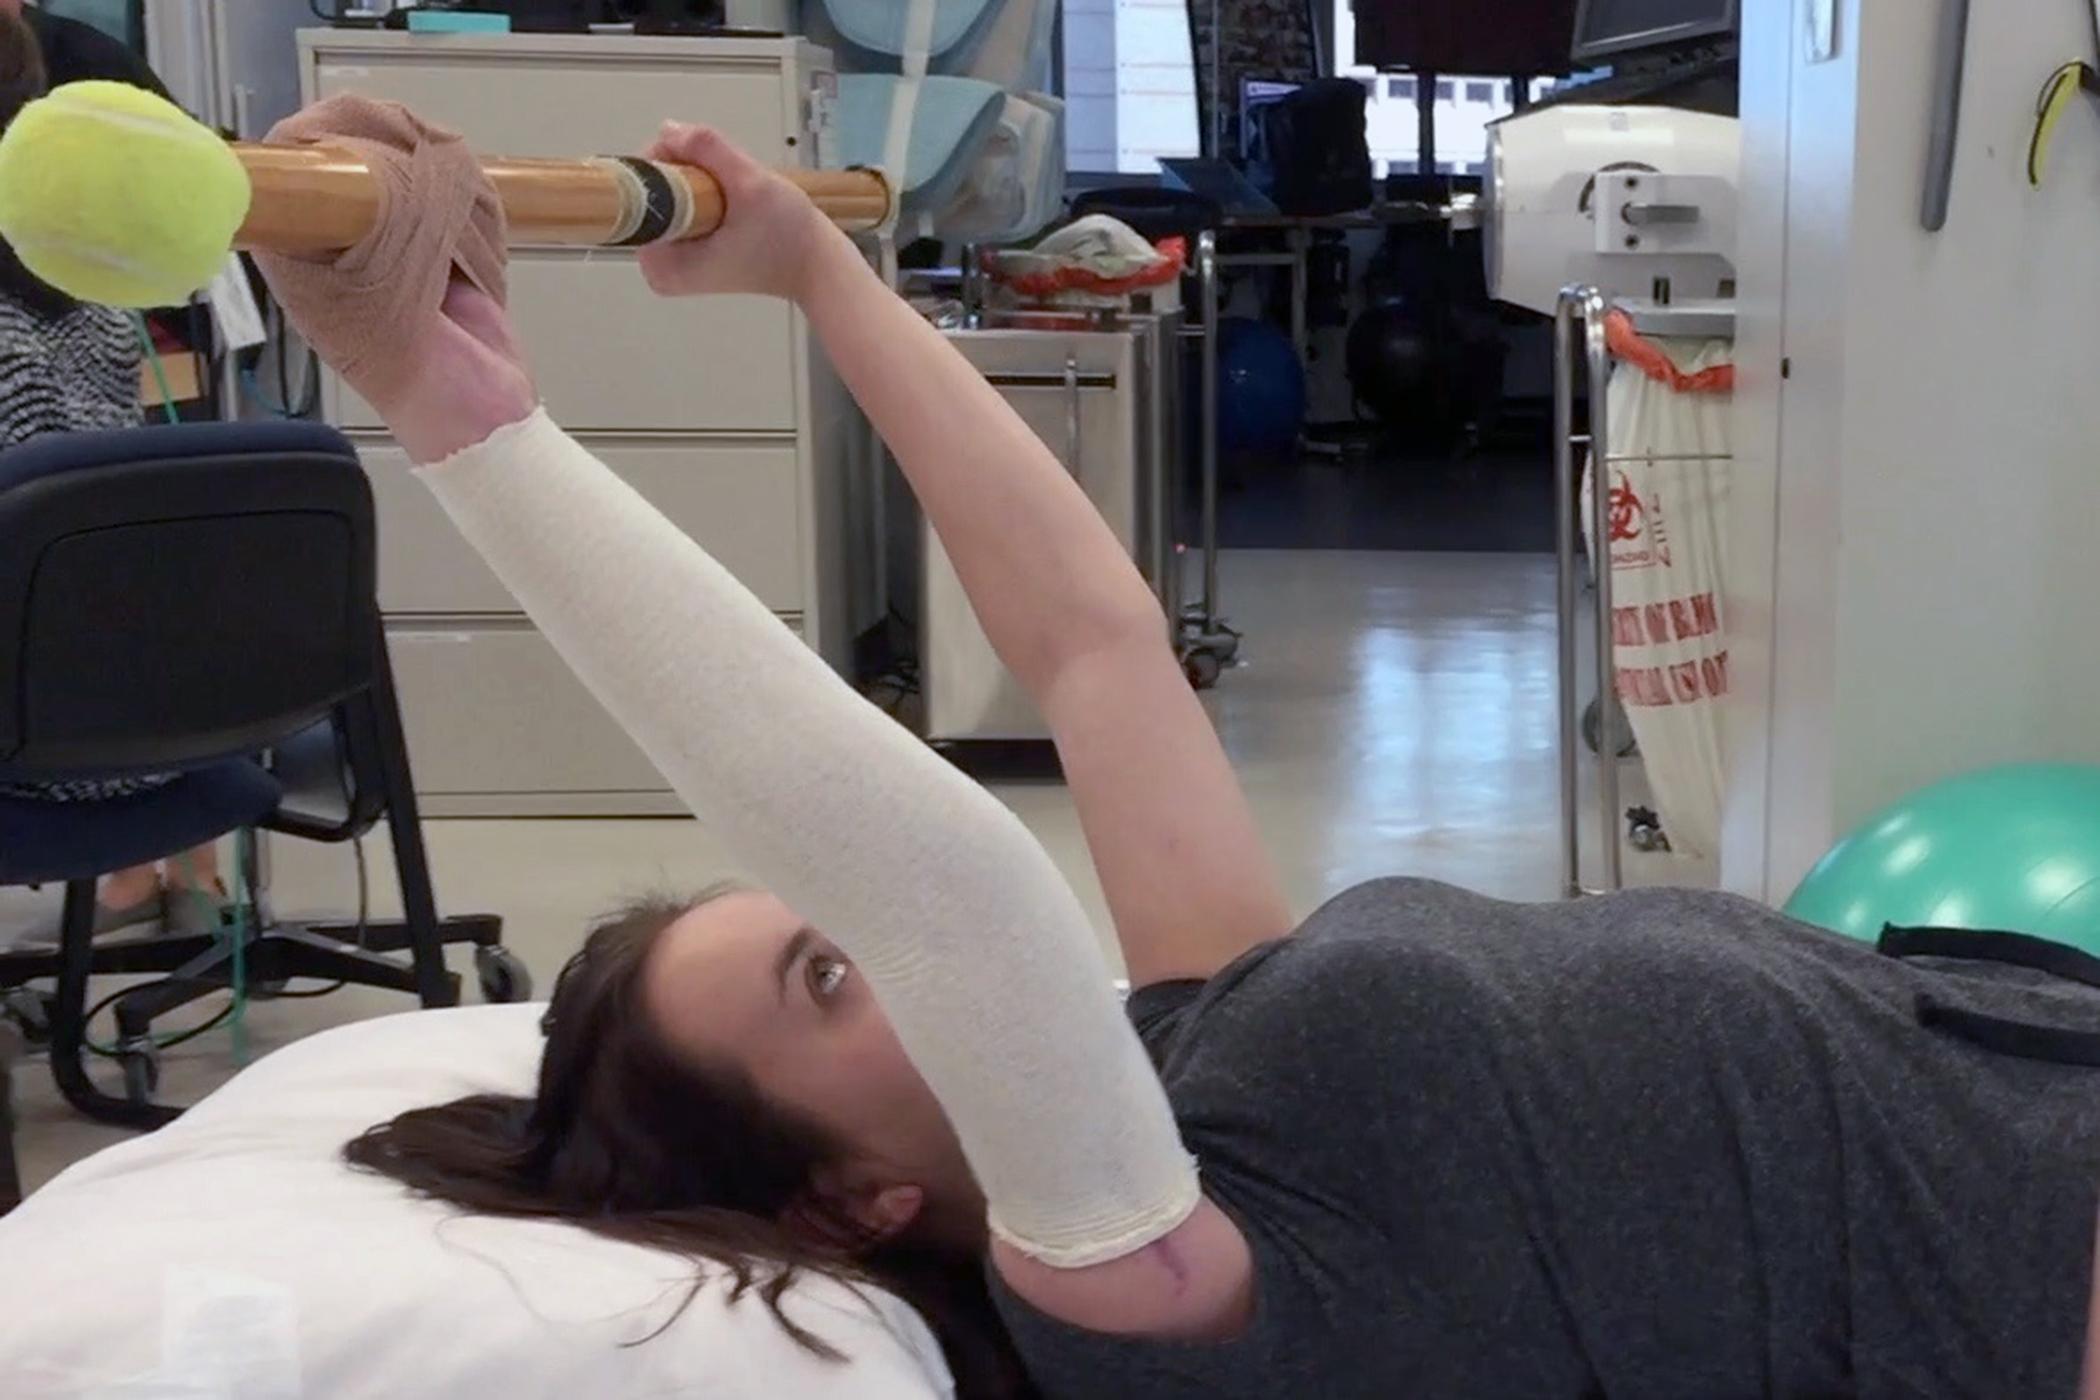 Medical Miracle Bamc Surgeons Perform Groundbreaking Arm